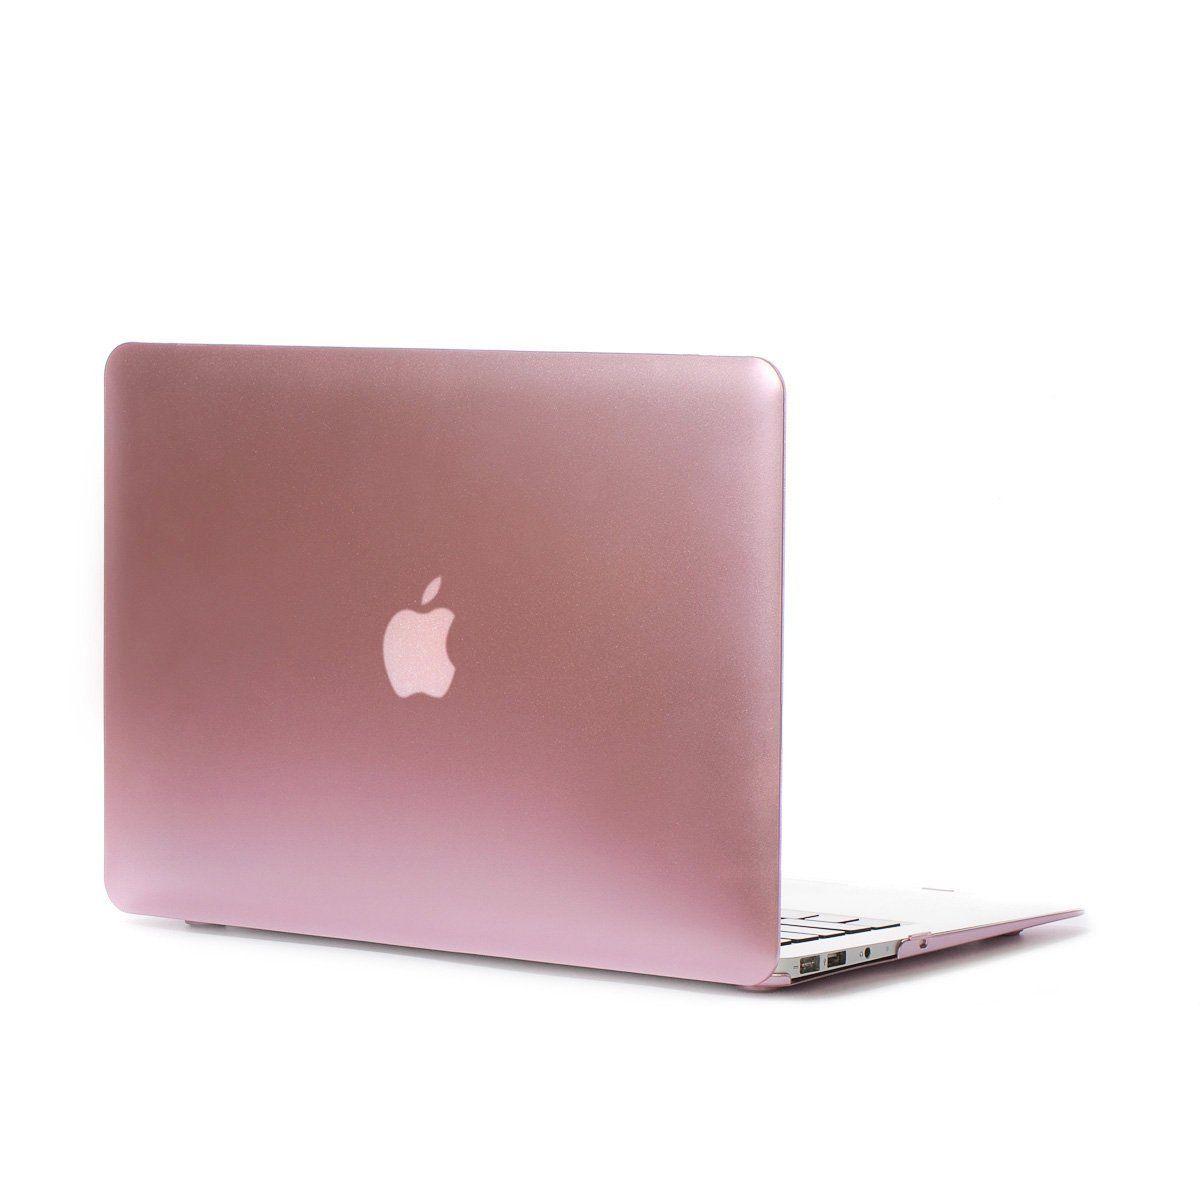 Amazon Com Macbook Pro 15 Inch Case With Retina Display Macbook Pro Cover Valkit Top Best Clear Crystal H Pink Macbook Macbook Pro Cover Macbook Pro Case